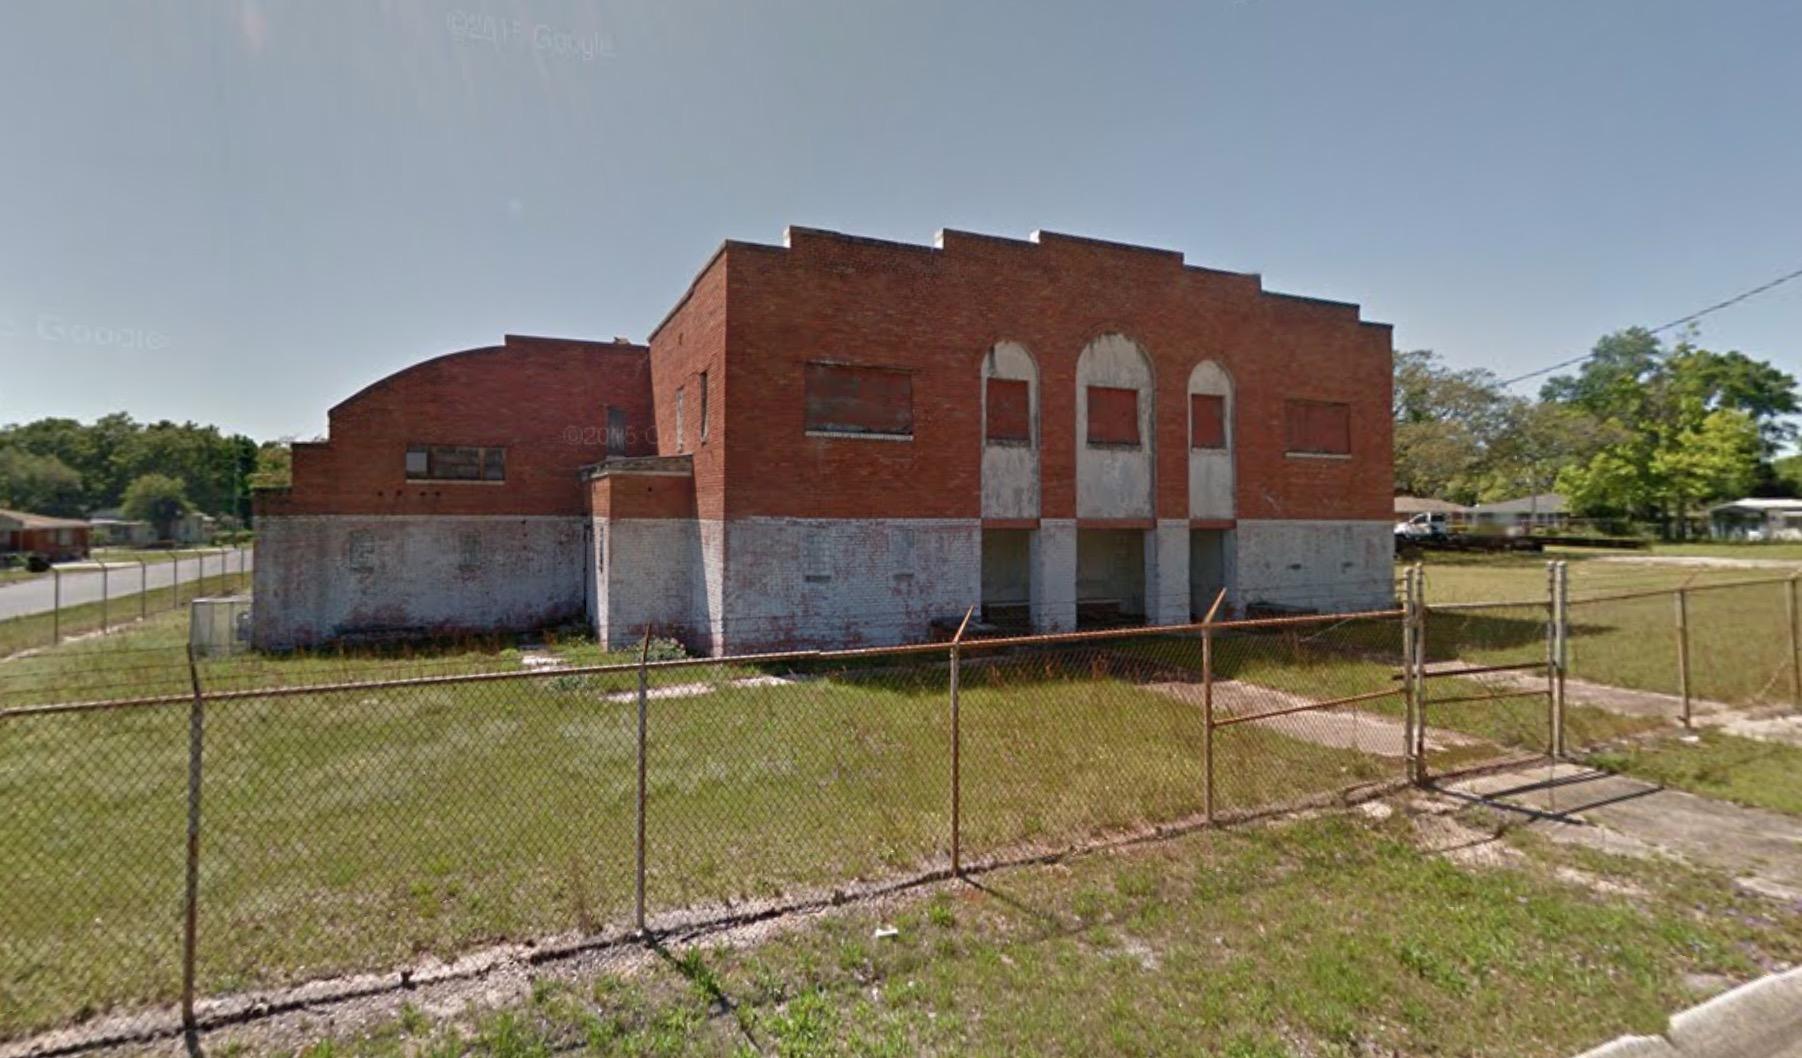 #3 - Washington Jr. High School Gymnasium806 West De Soto StreetBuilt 1939